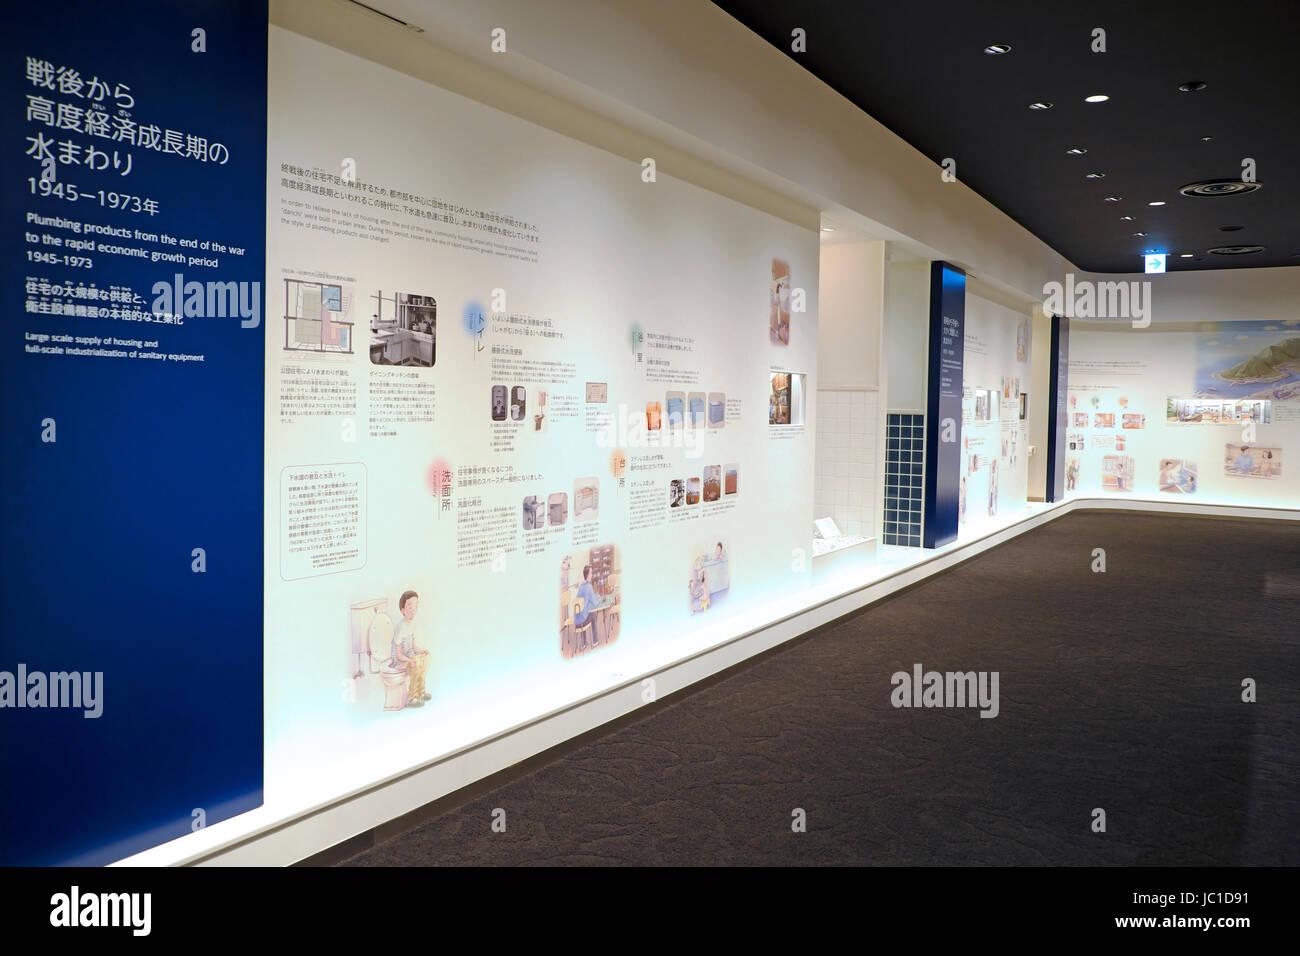 History of Japanese toilets in Toto Museum, Kitakyushu Stock Photo ...